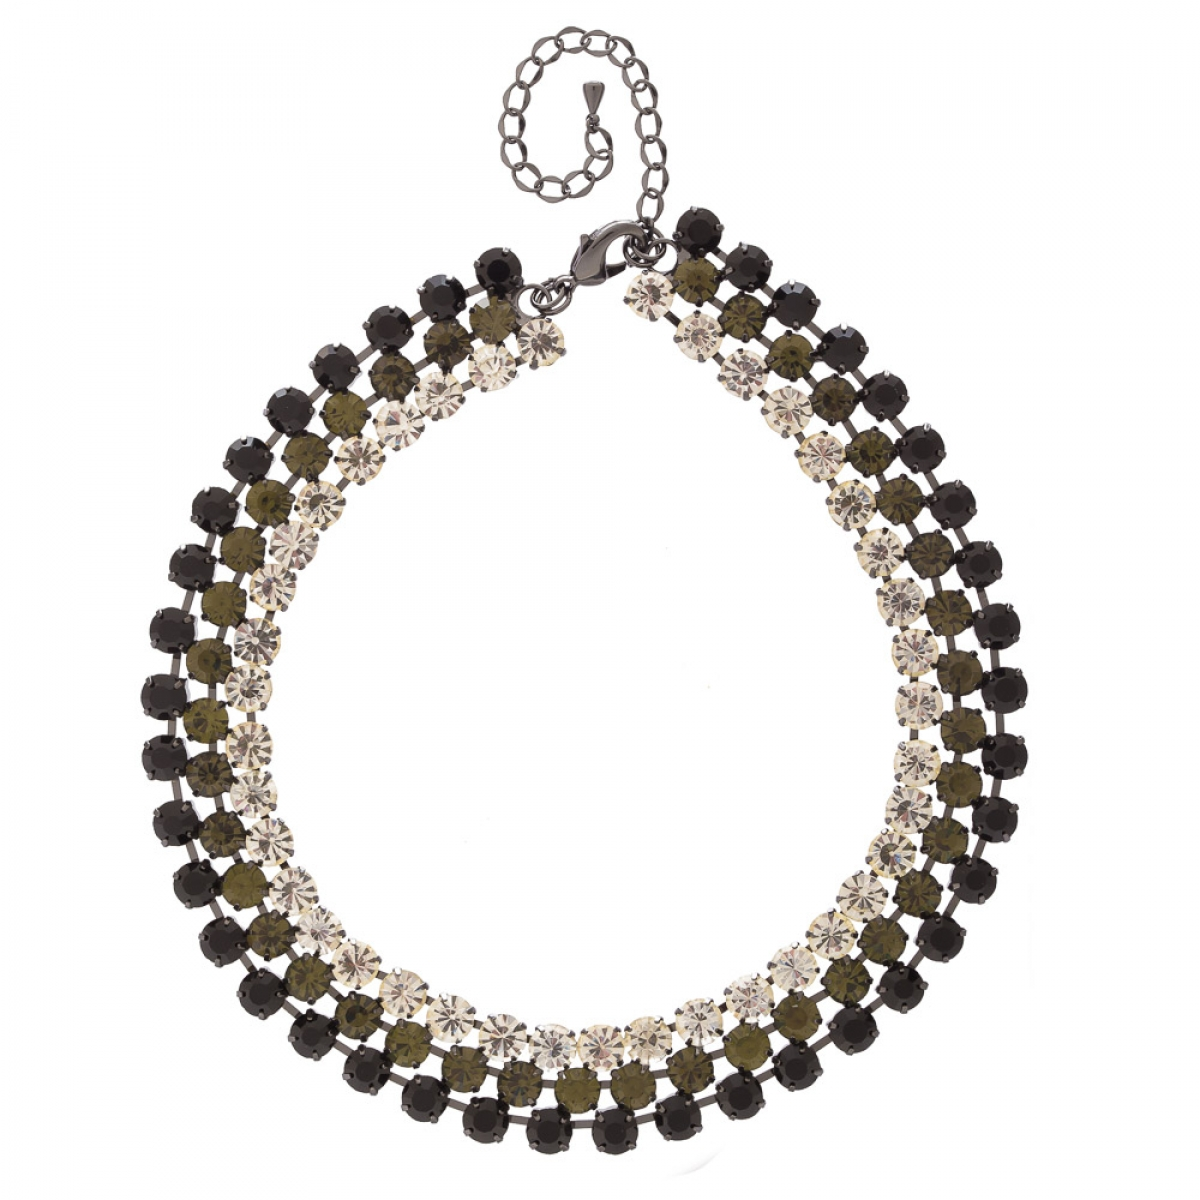 Náhrdelník Elegance Black - Grey - Crystal